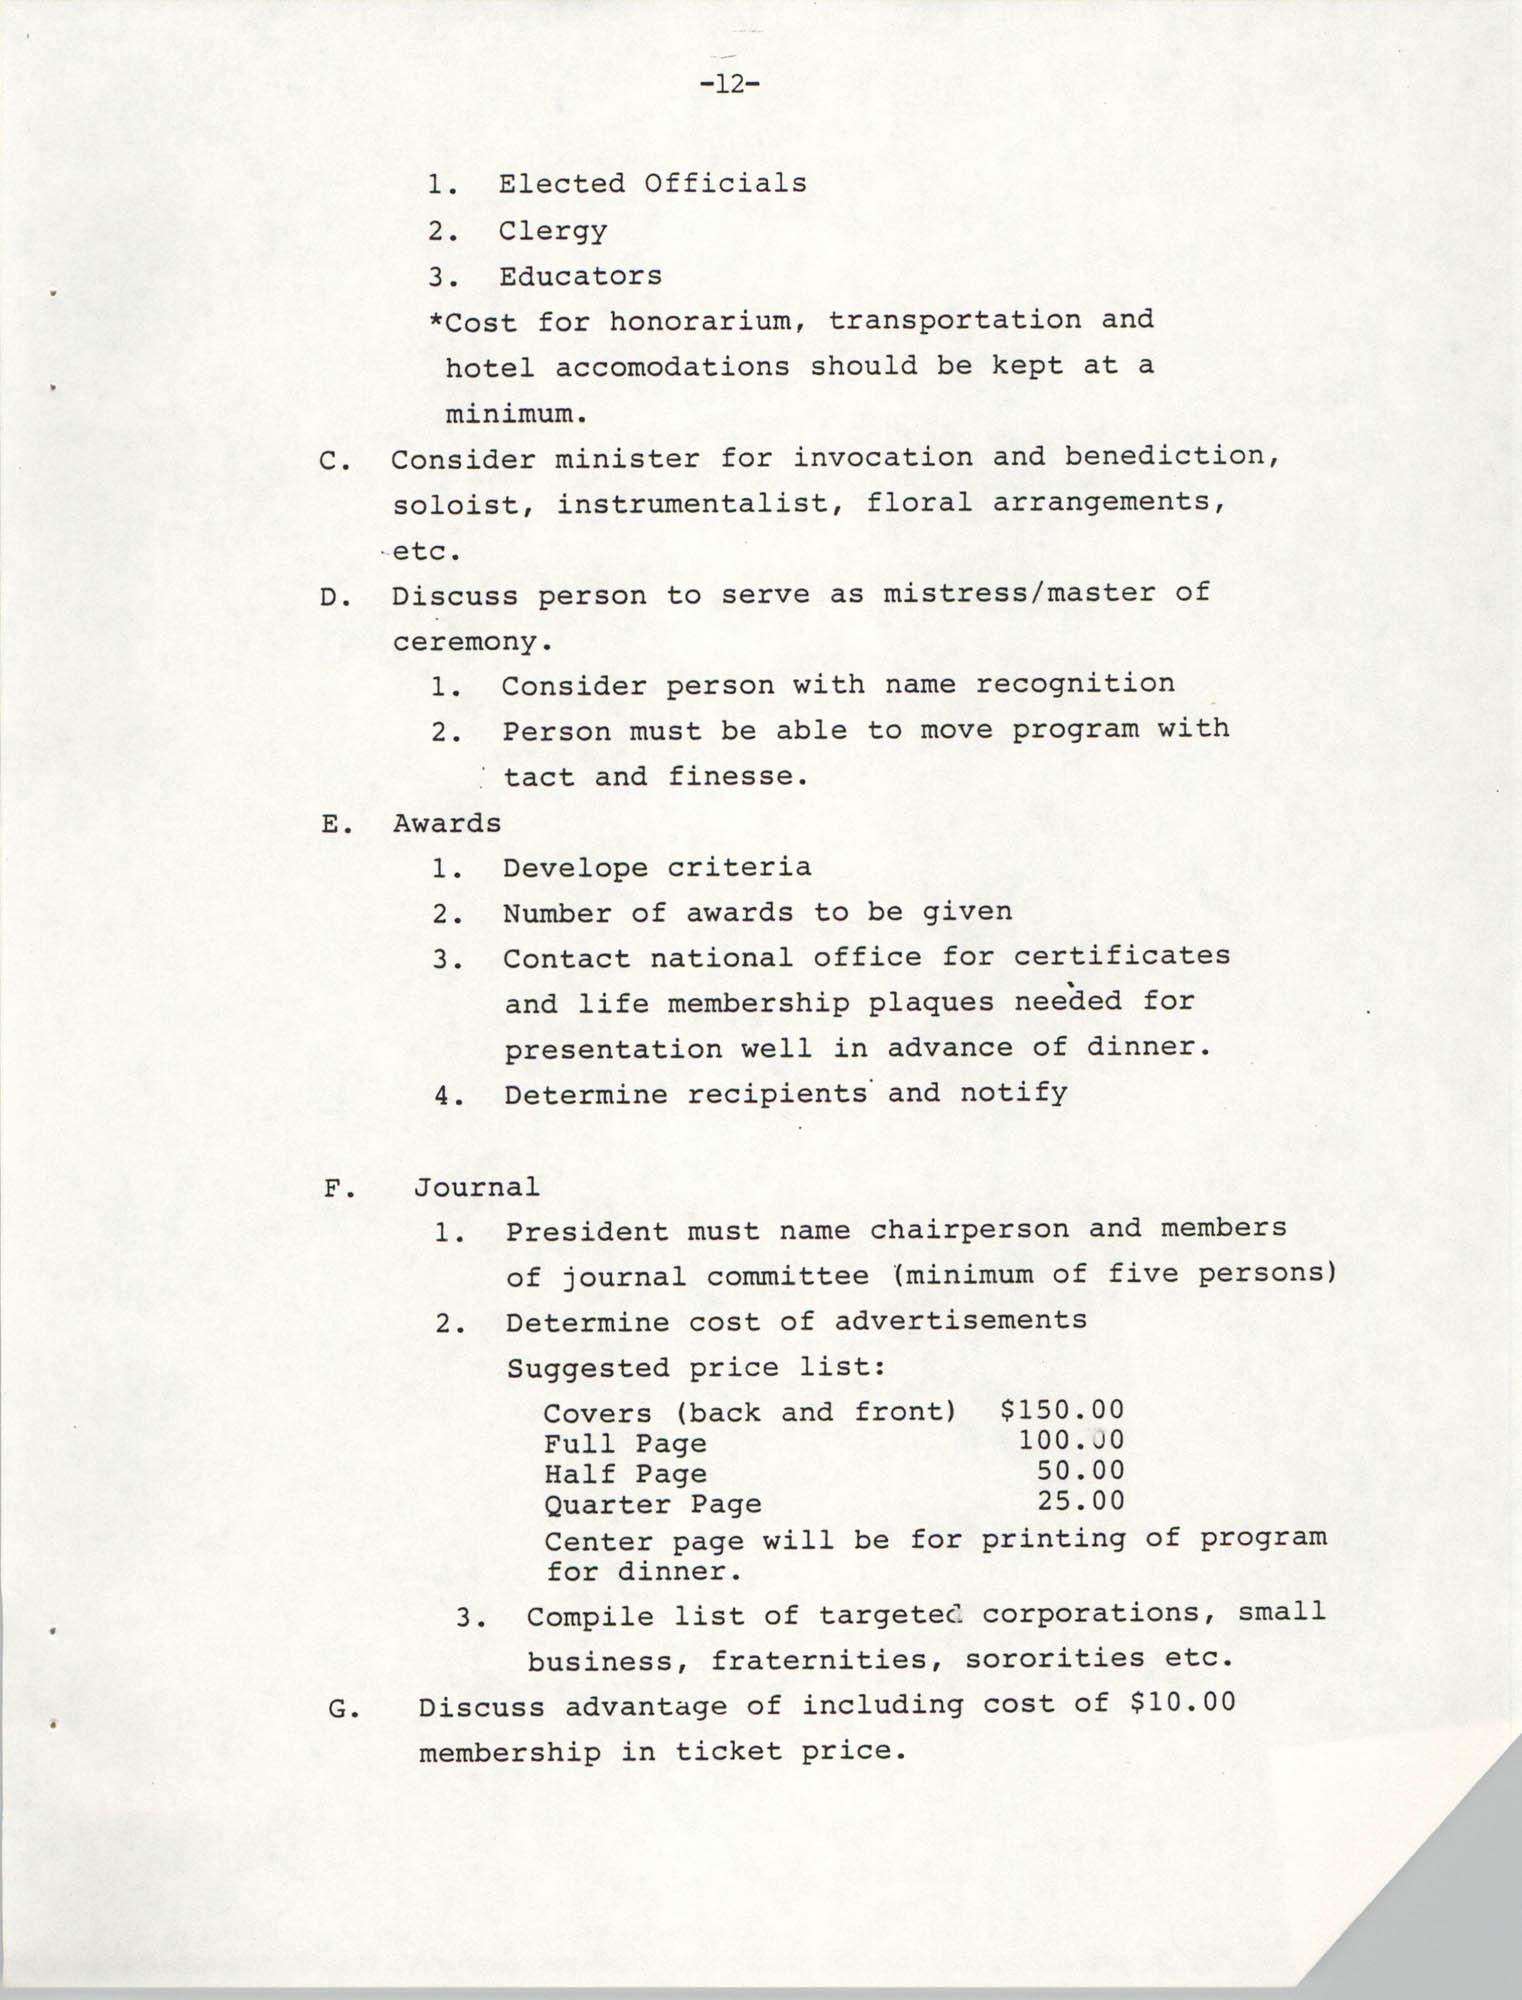 NAACP Mandatory Training Handbook, 1989, Page 12